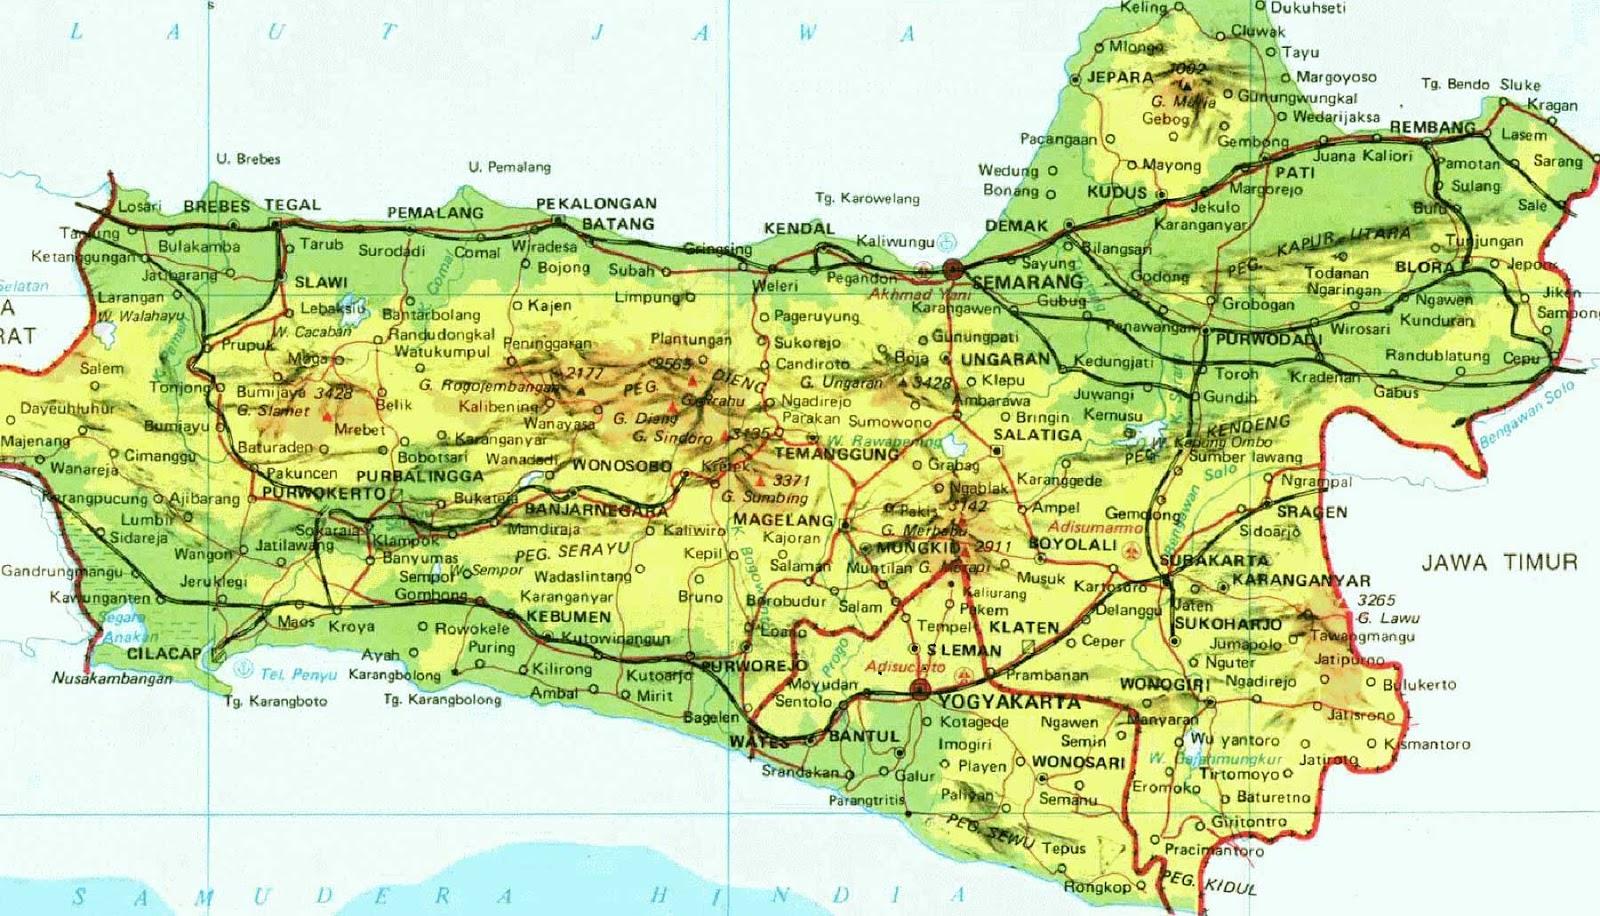 Gambar Peta Kabupaten dan kecamatan di Jawa Tengah